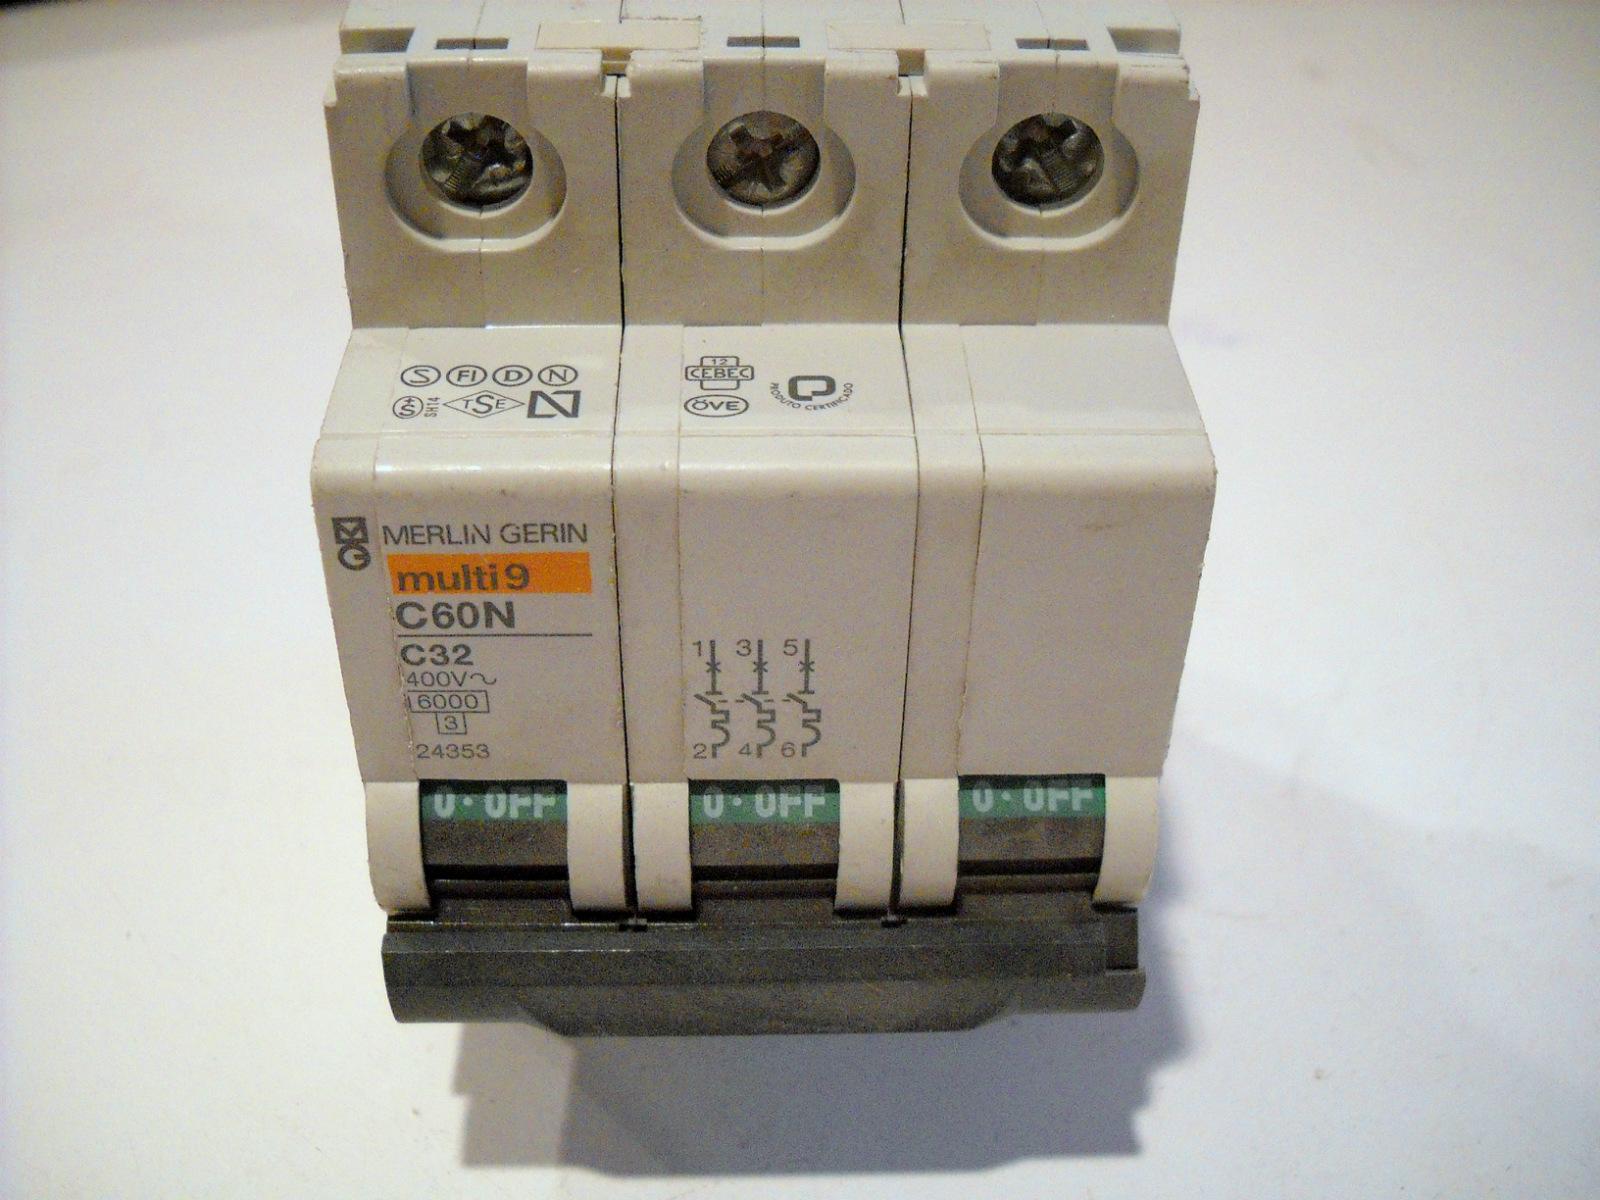 New merlin gerin multi 9 circuit breaker 3 pole 32a 400v - Merlin gerin multi 9 ...